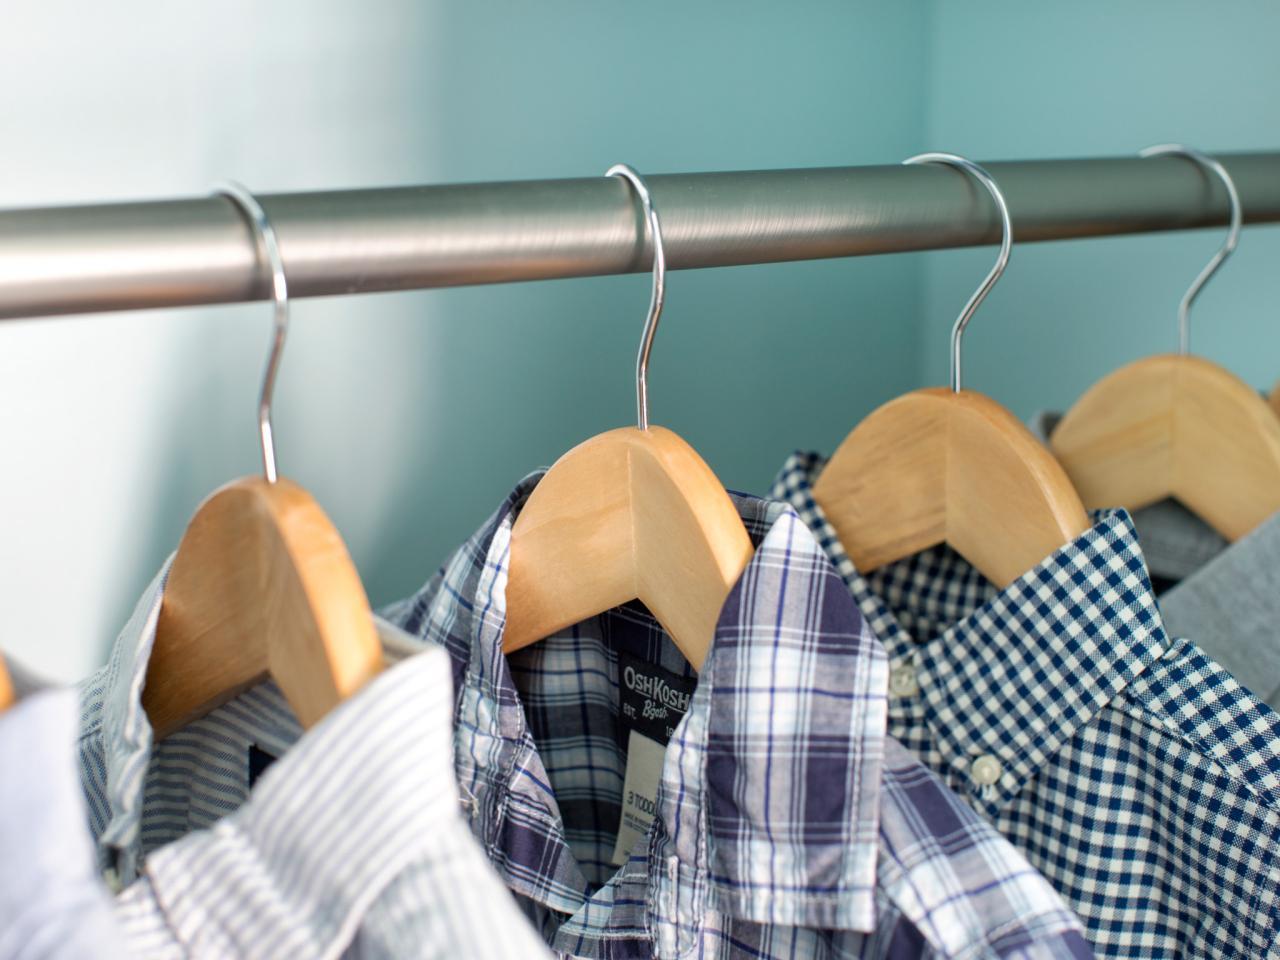 Closet Organization and Storage Tips | HGTV\'s Decorating & Design ...